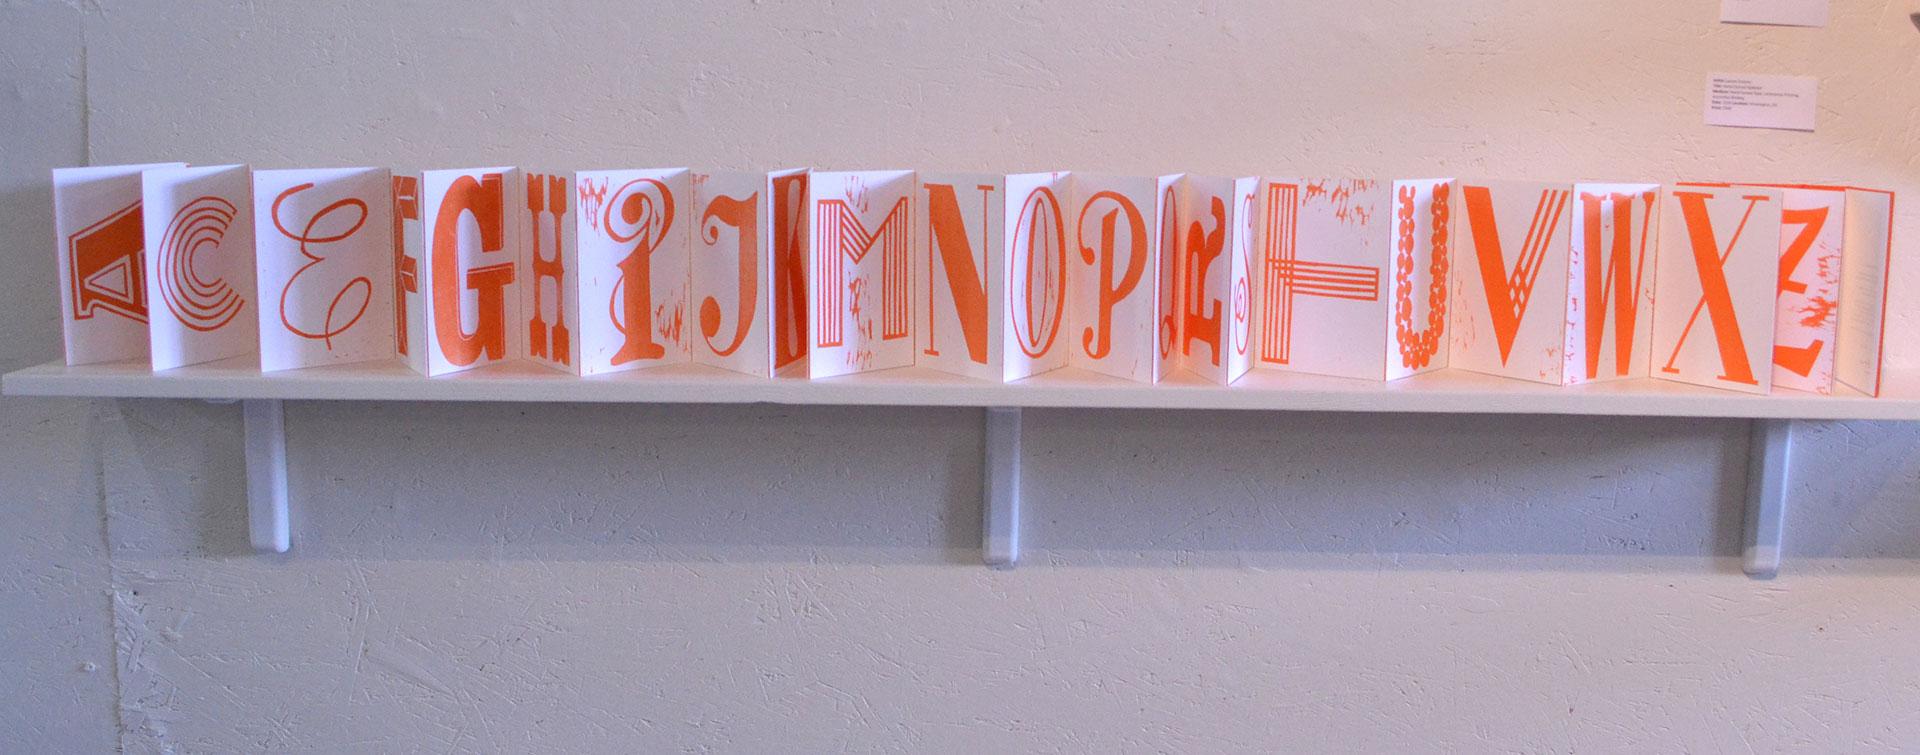 Lauren Emeritz, Hand-Carved Alphabet, Hand-Carved Type, Letterpress Printing, Accordion Binding, 2016